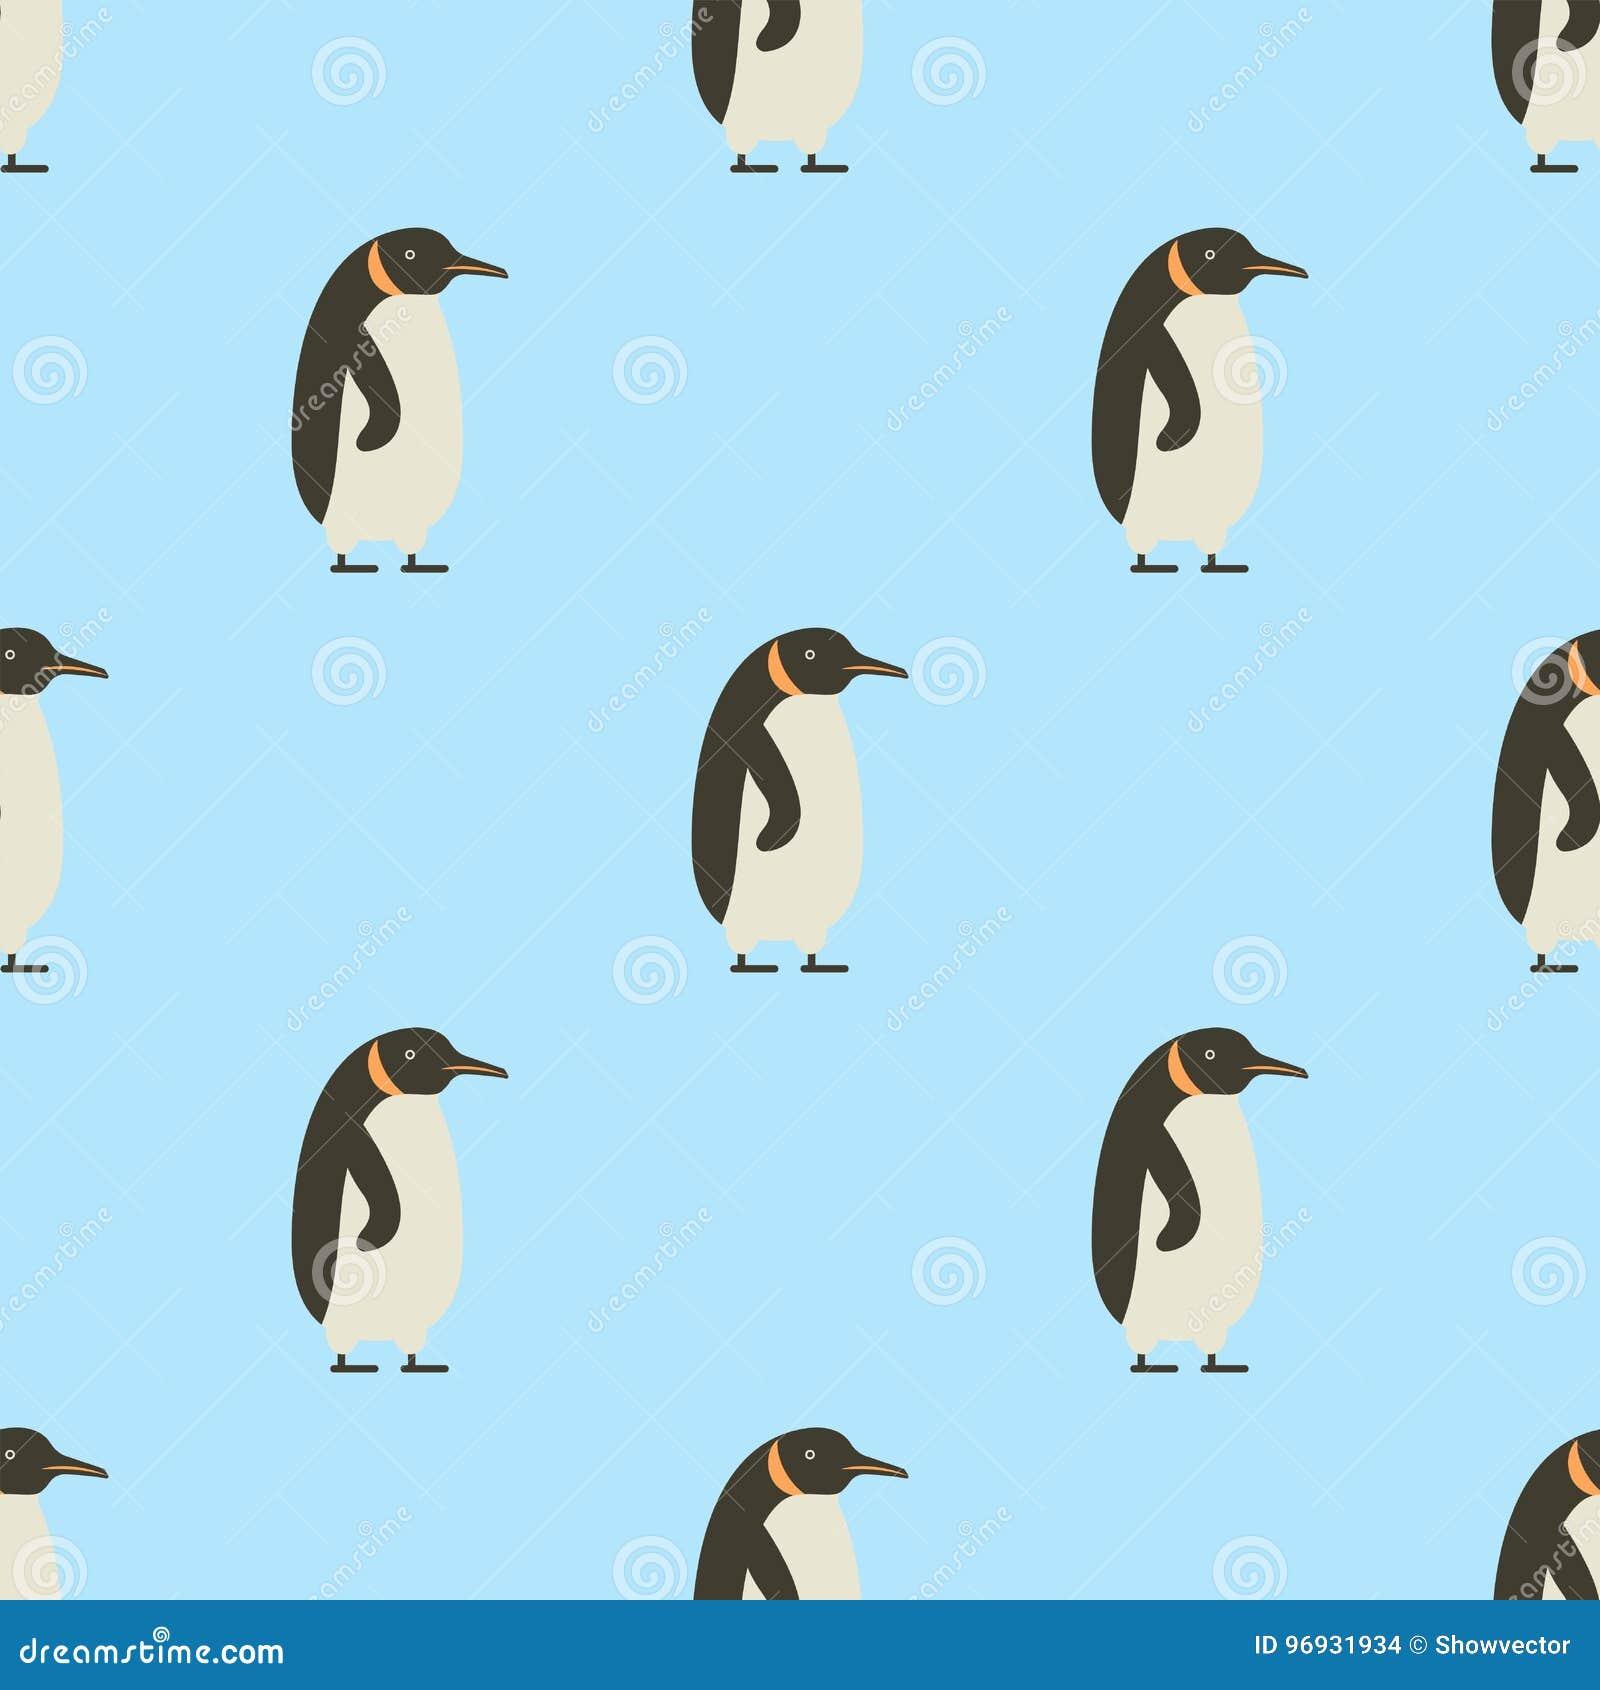 Seamless Pattern Of Penguins On Blue Background Winter Bird